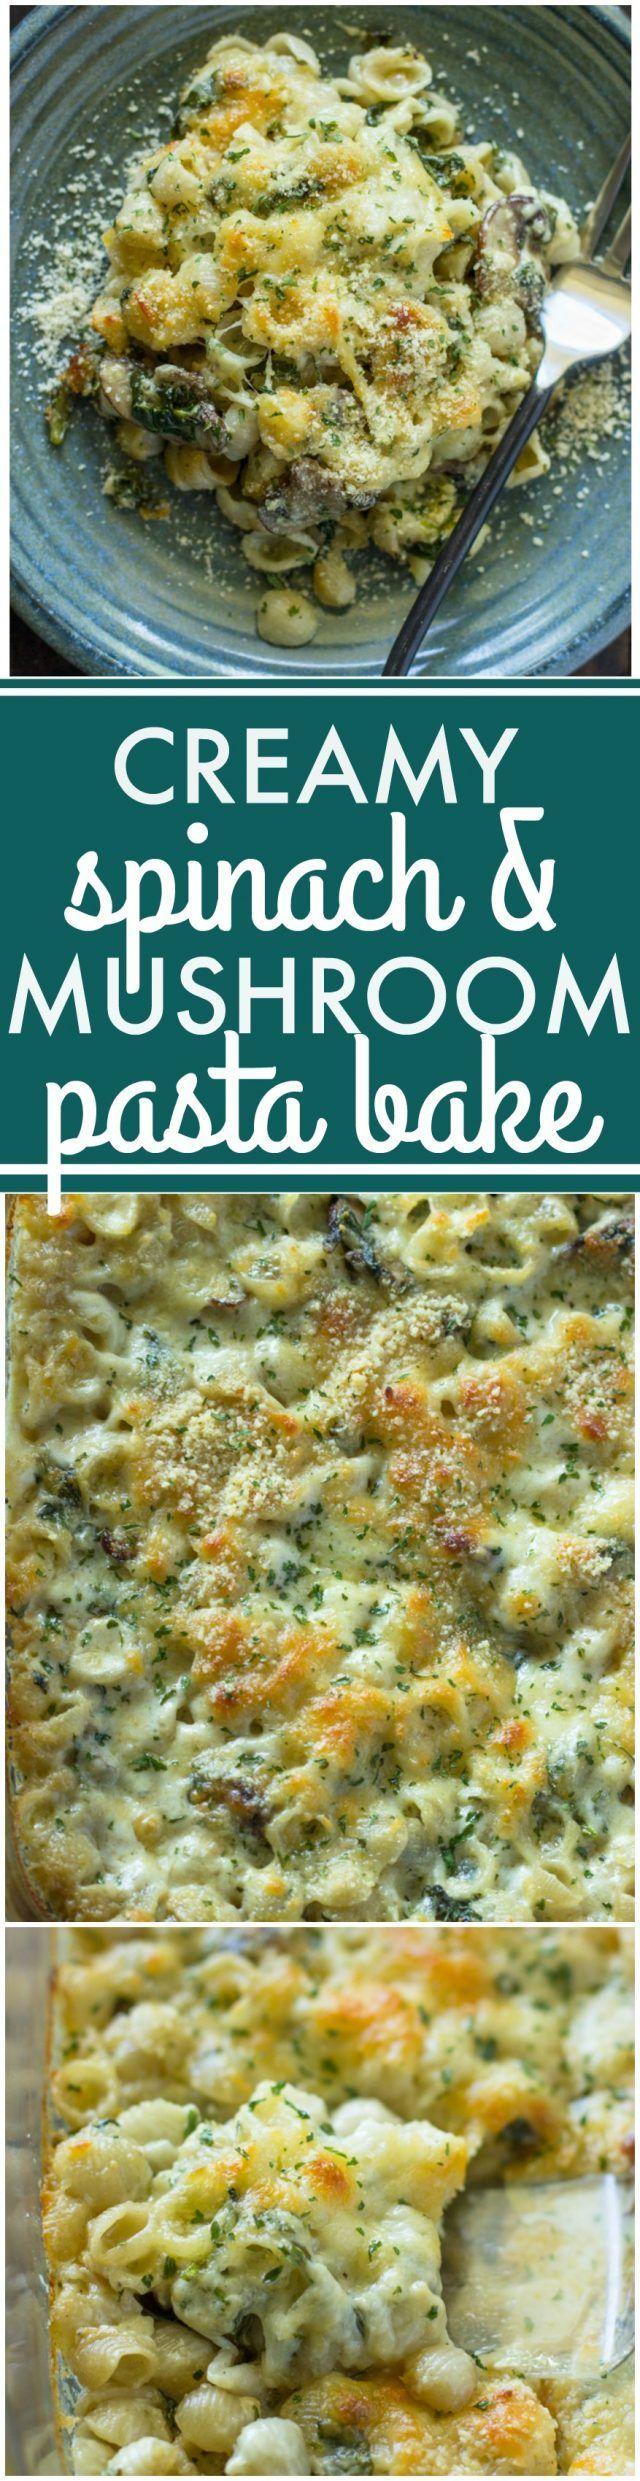 Best 25 vegetarian pasta bake ideas on pinterest pasta for Creamy spinach pasta bake